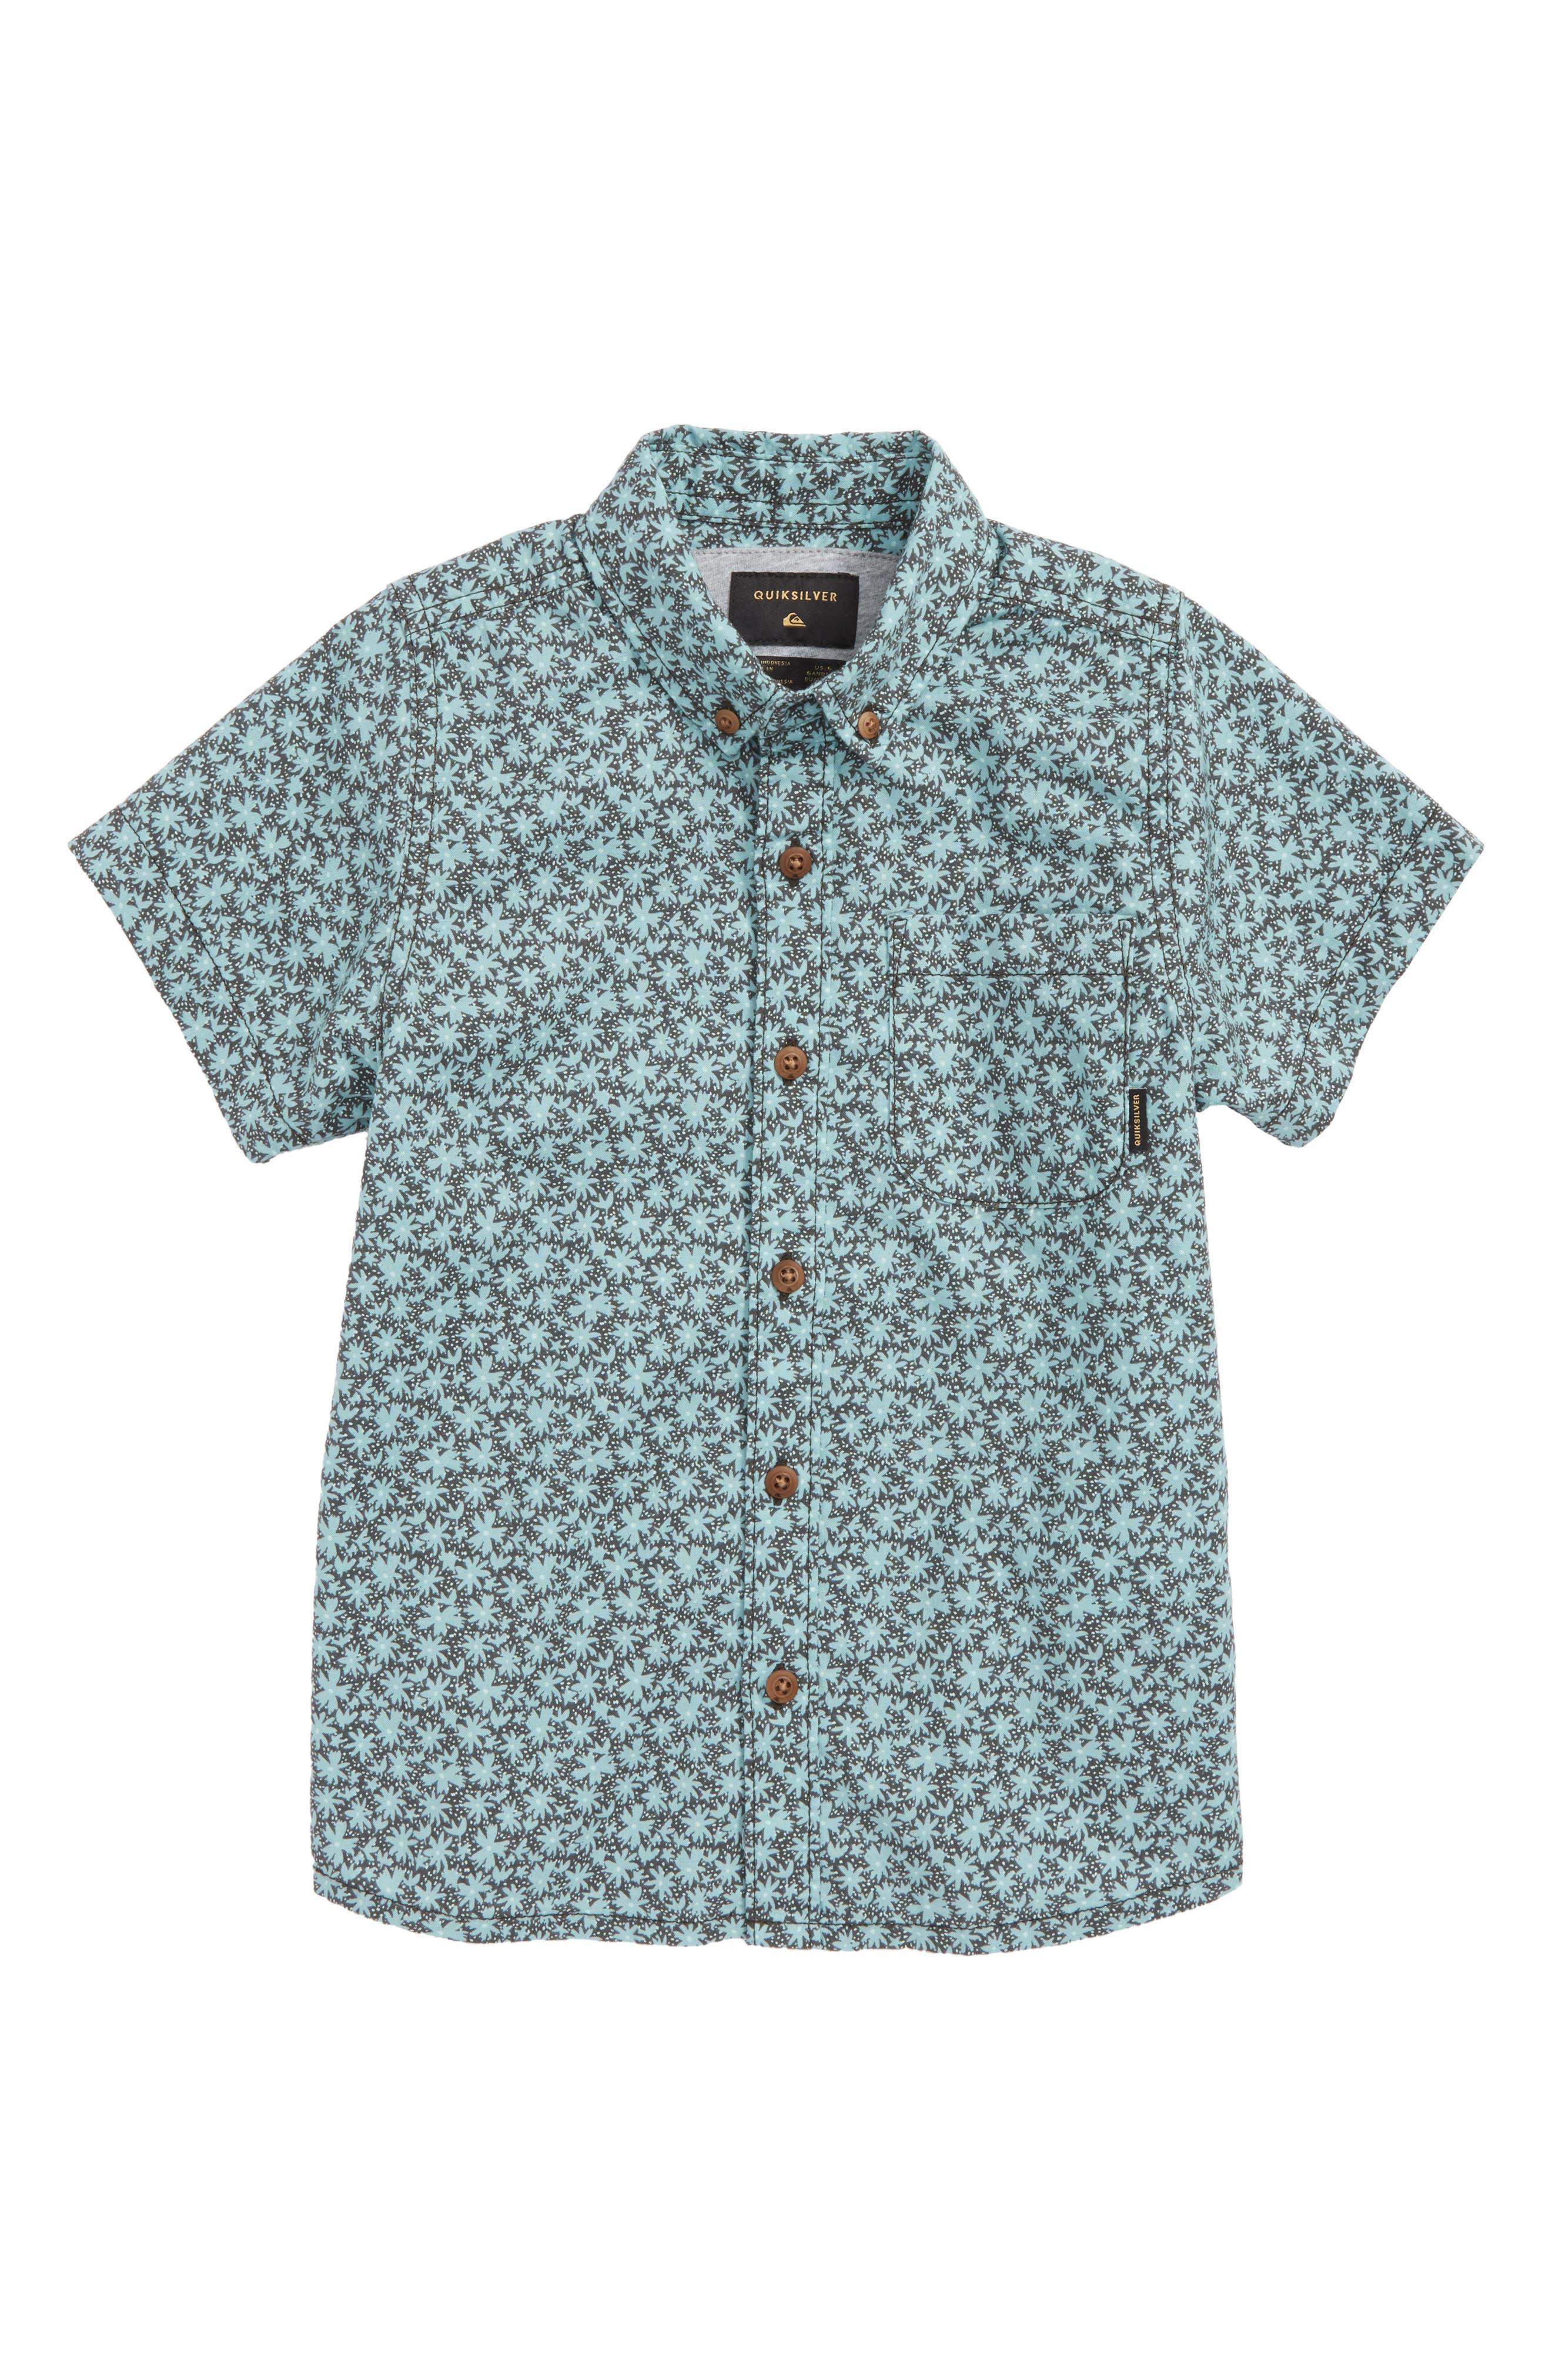 Minikani Woven Shirt,                         Main,                         color, 020